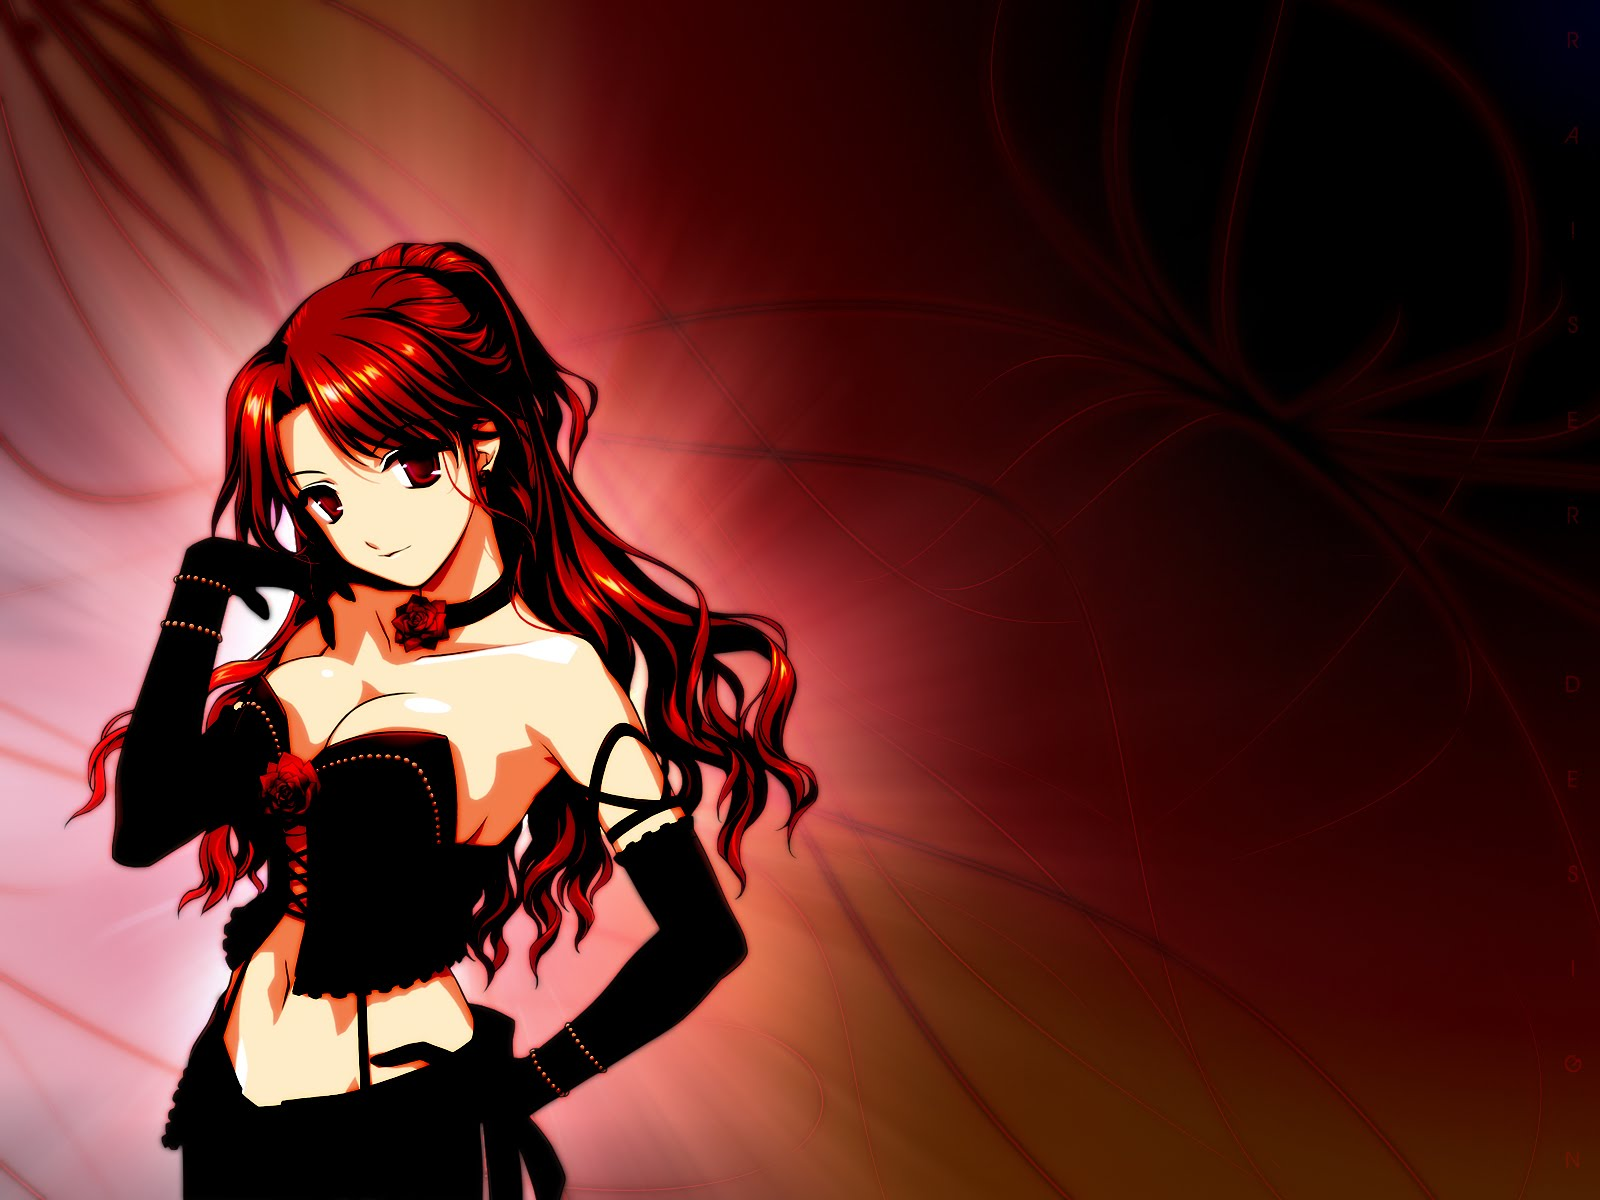 http://4.bp.blogspot.com/_L_3zh3HTK9w/S6vIDJT6ItI/AAAAAAAAC2c/9lLiG899mKw/s1600/busty-anime-babe.jpg